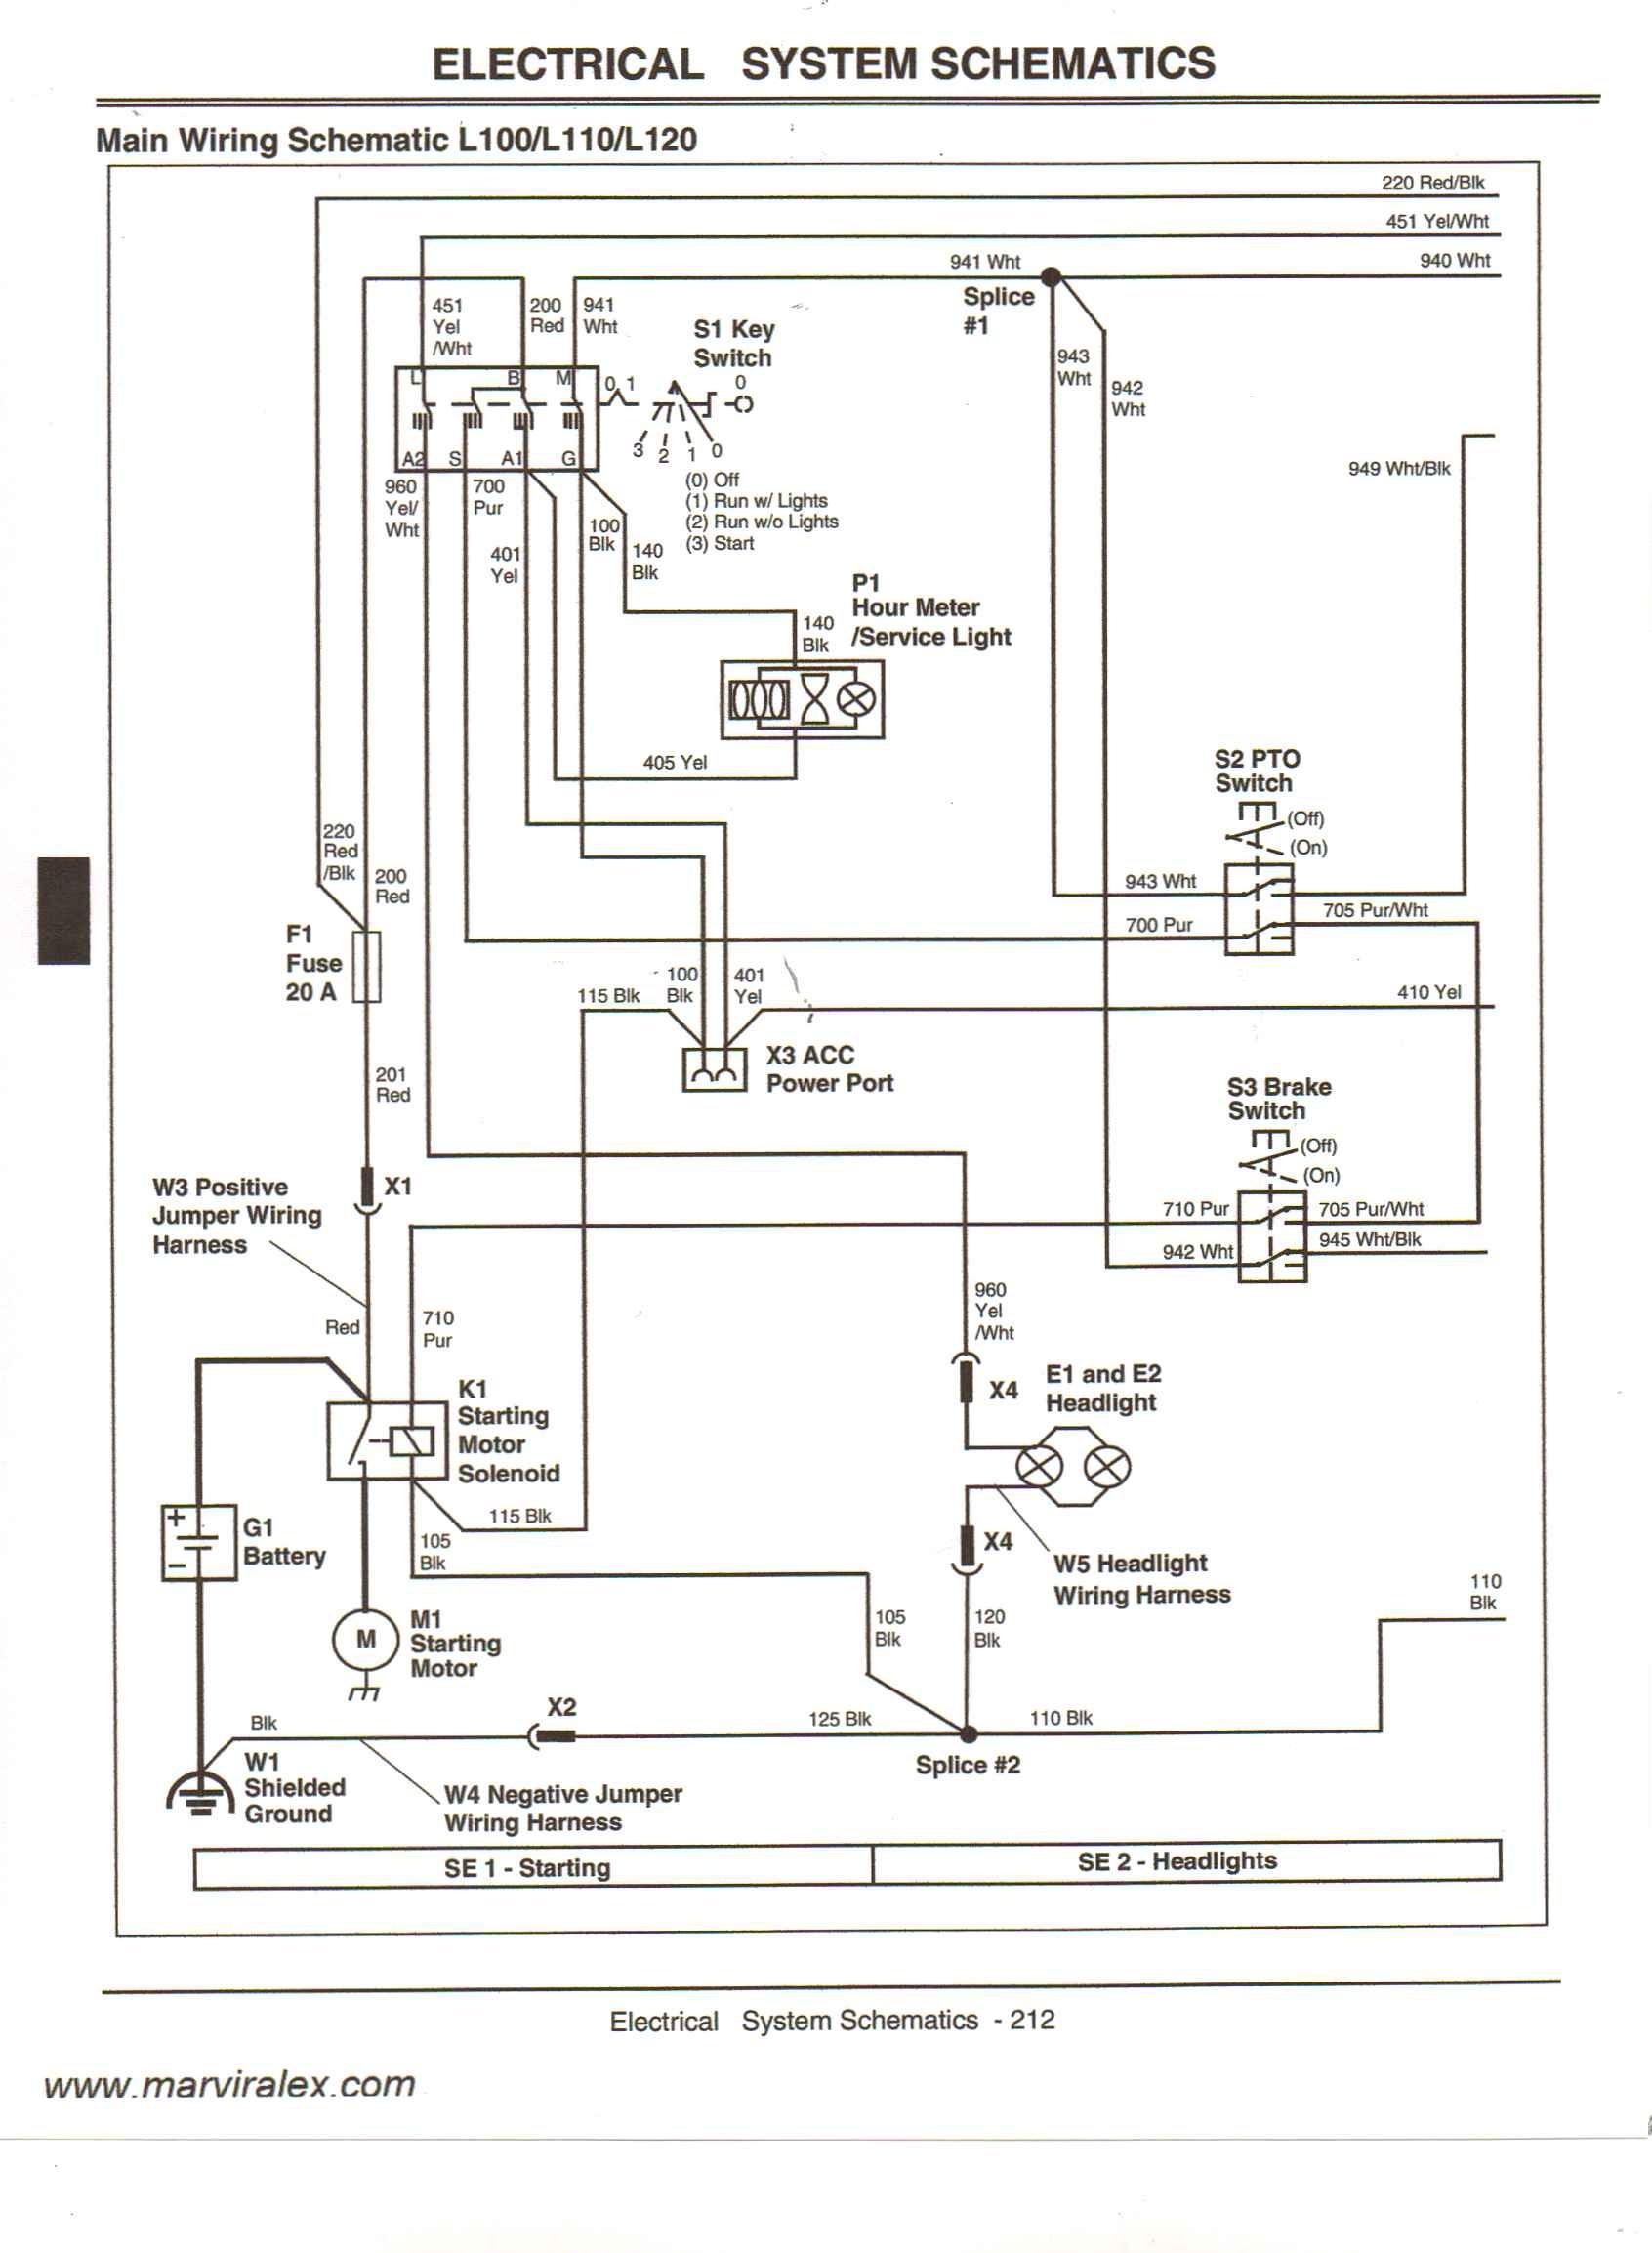 john deere 820 fuse box diagram lt160 john deere fuse box wiring diagram schematic  lt160 john deere fuse box wiring